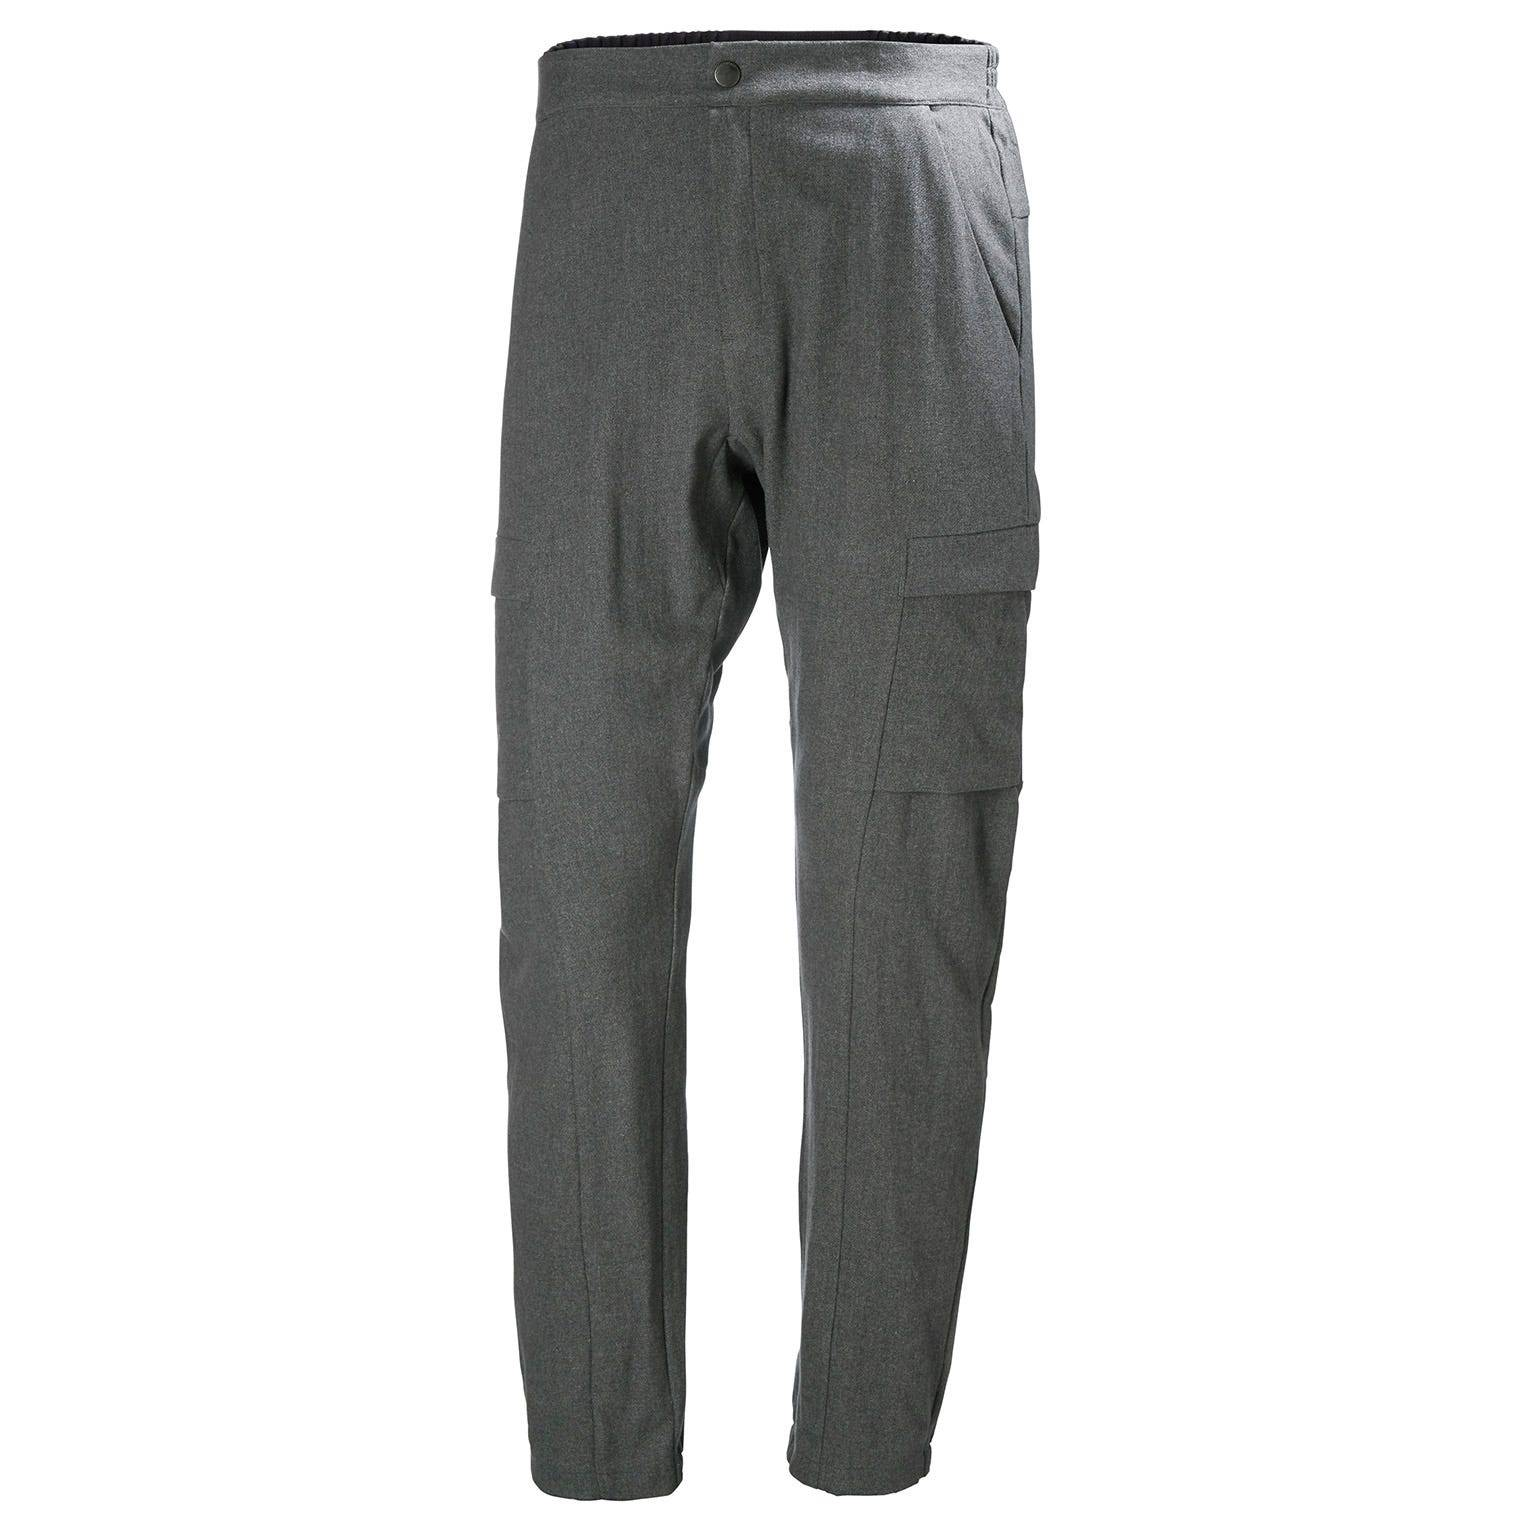 Helly Hansen Wool Travel Hiking Pant Grey L